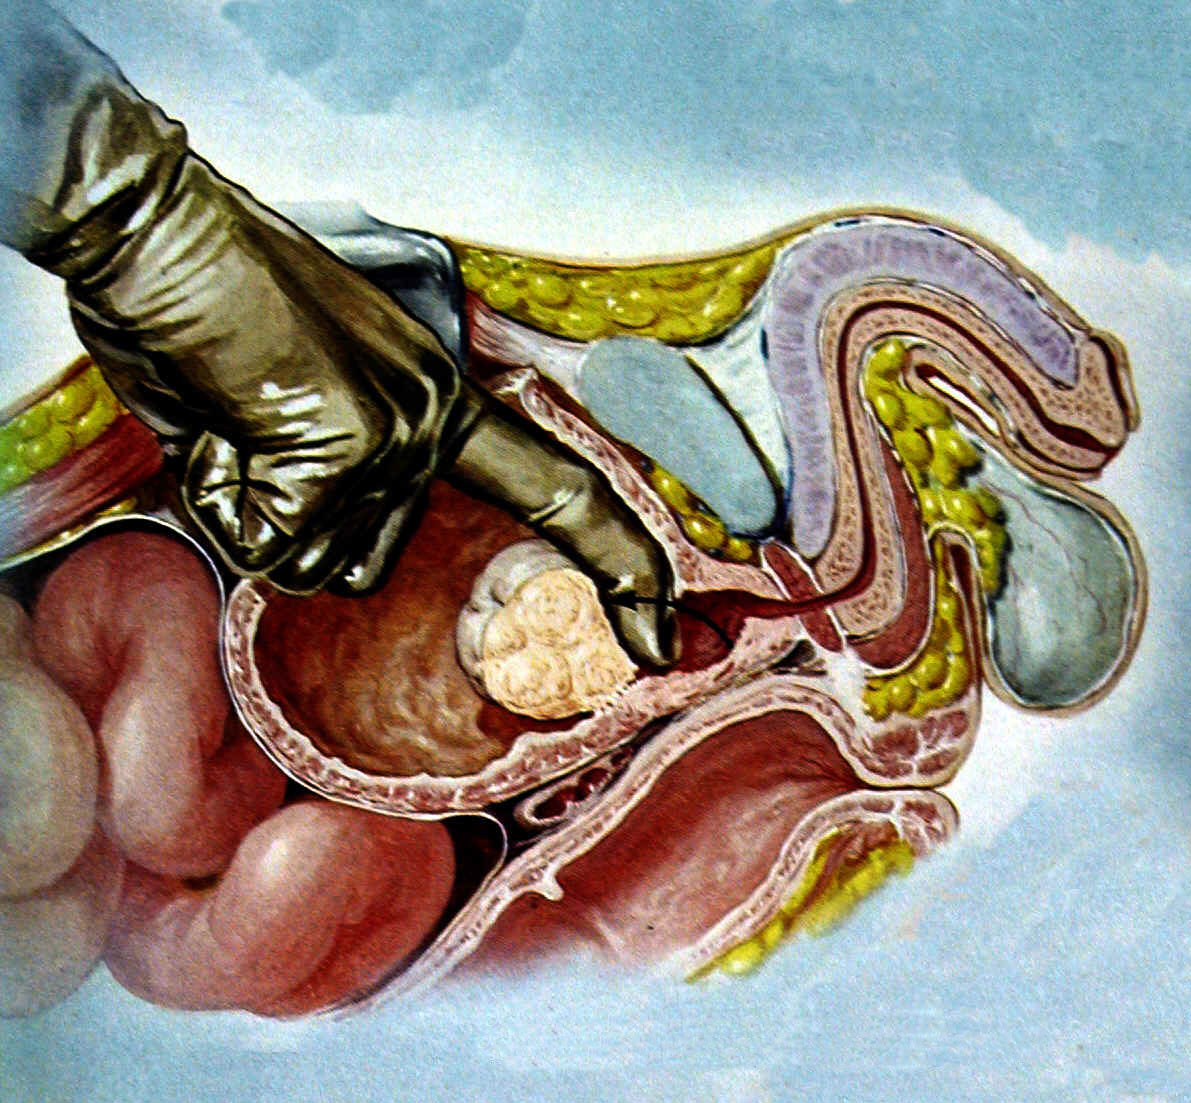 хирургическое удаление жира на животе видео